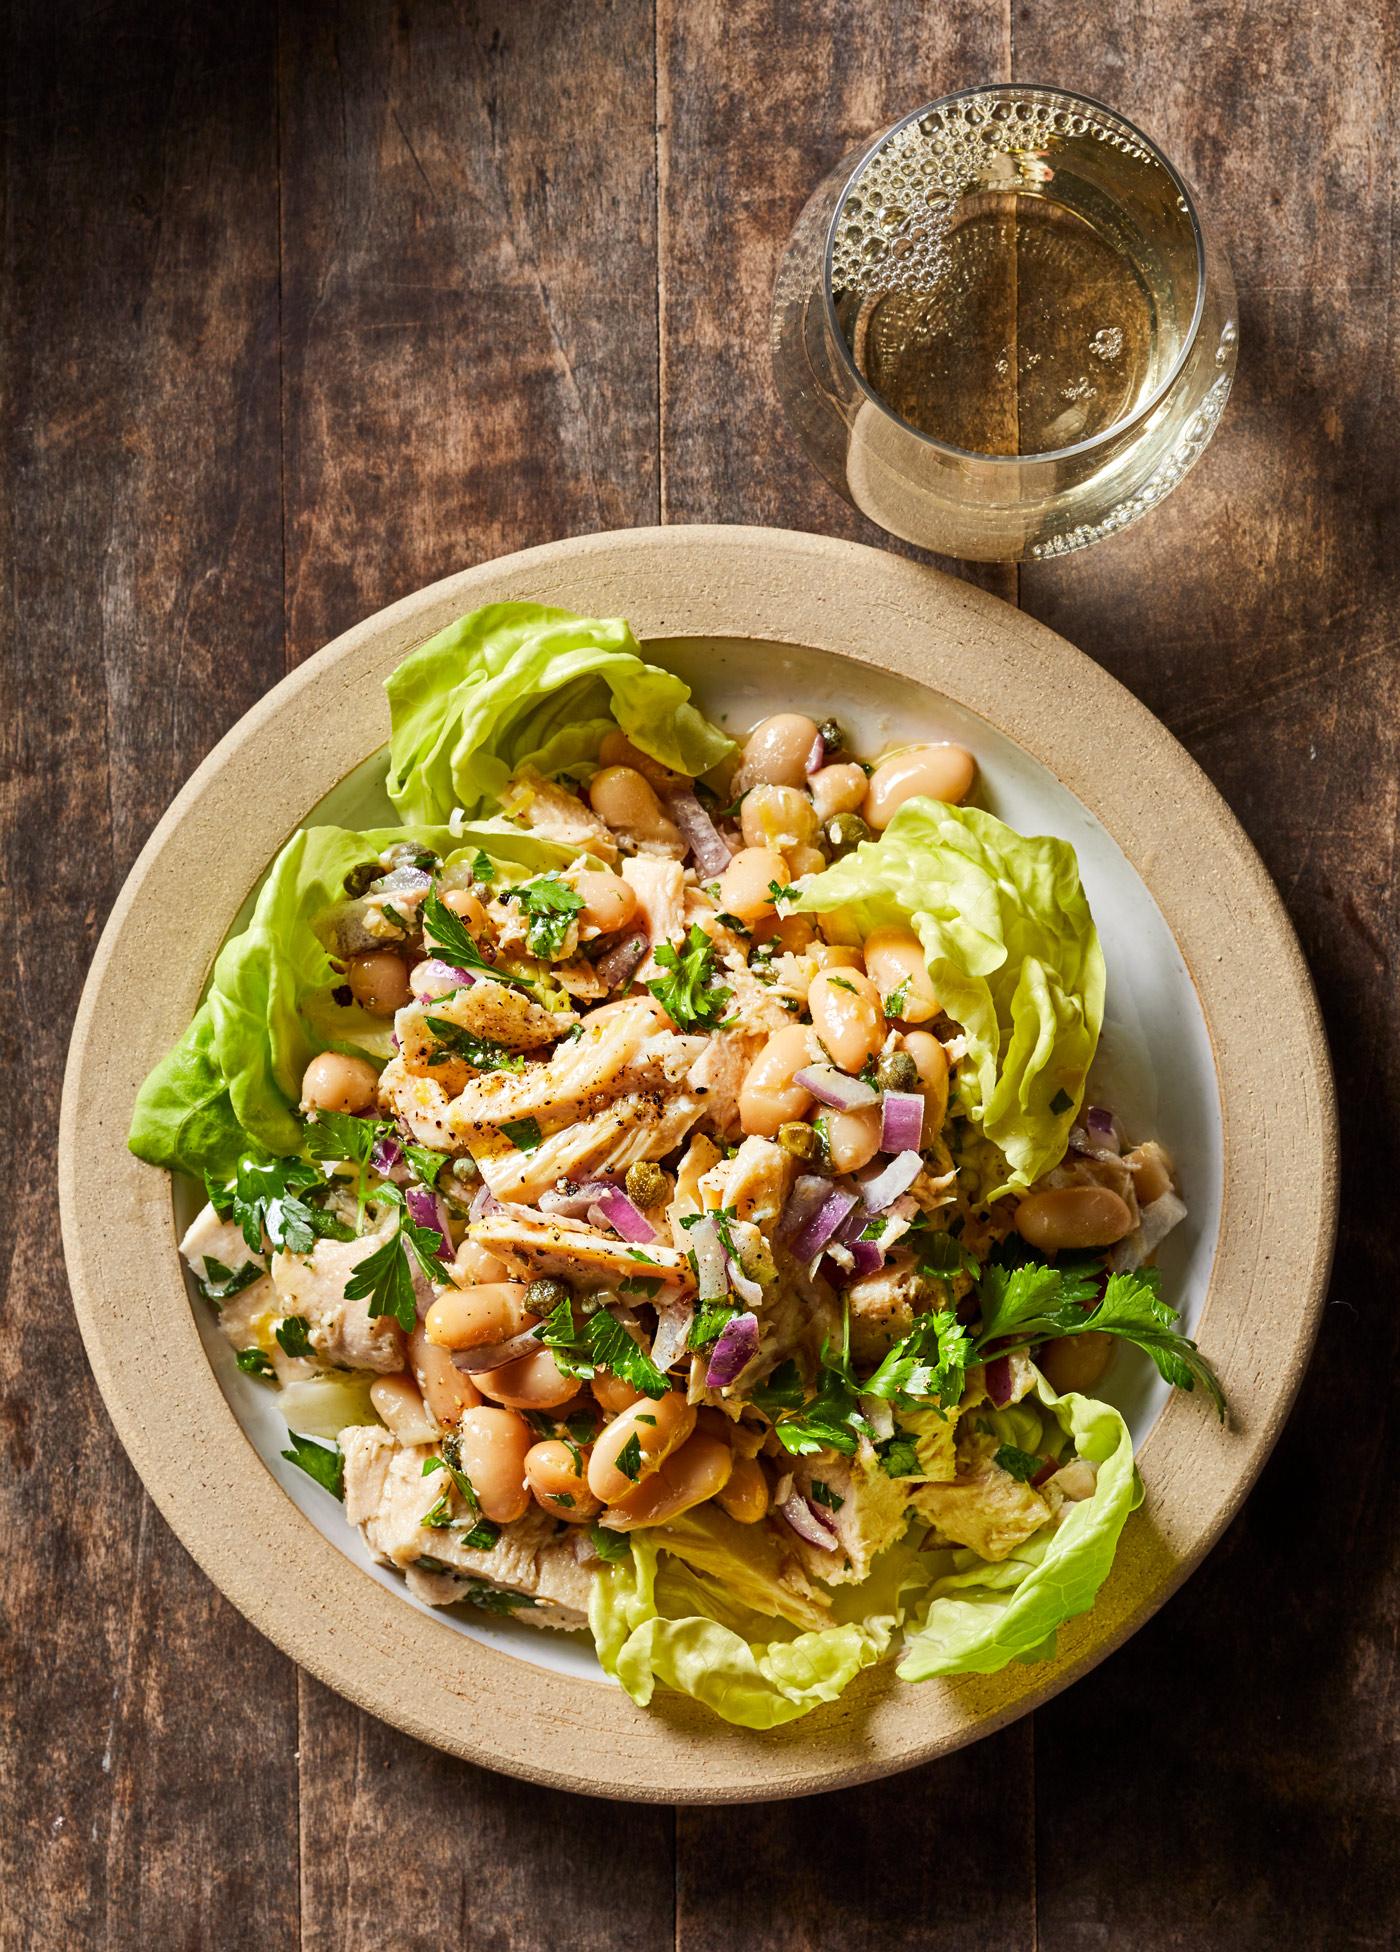 Tuna and White Bean Salad with Lemon